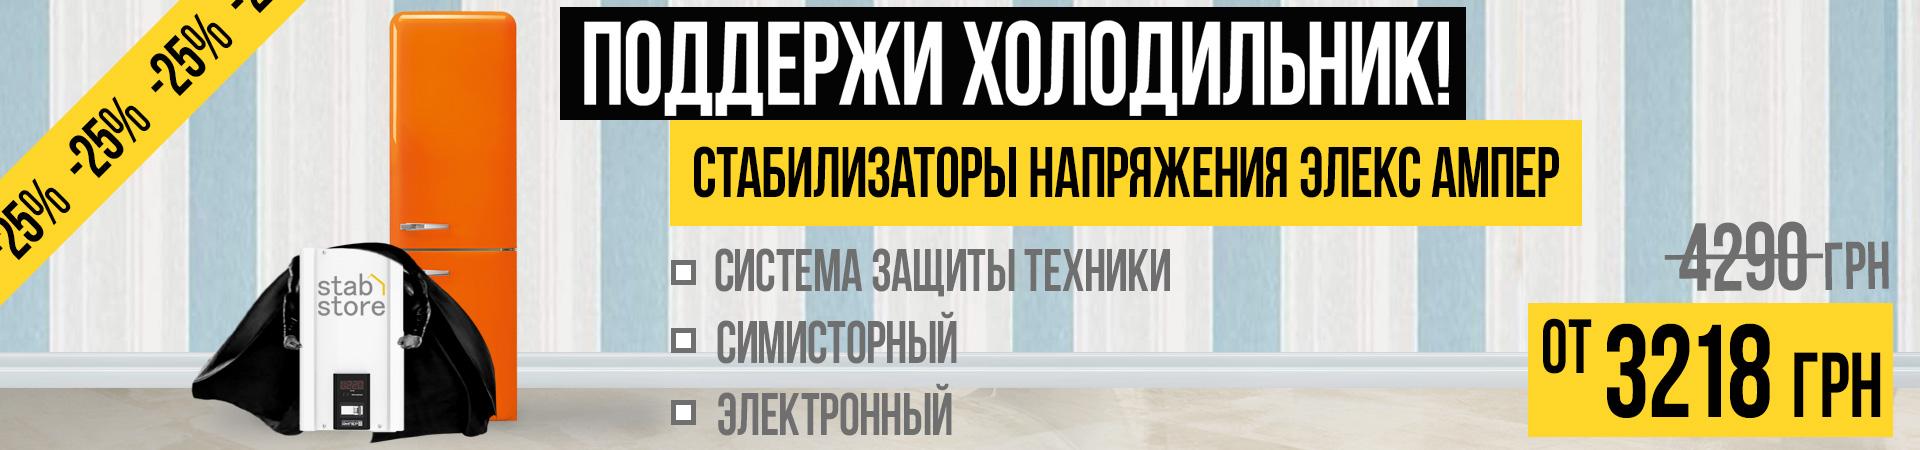 Акция! -25% на стабилизаторы напряжения ЭЛЕКС АМПЕР